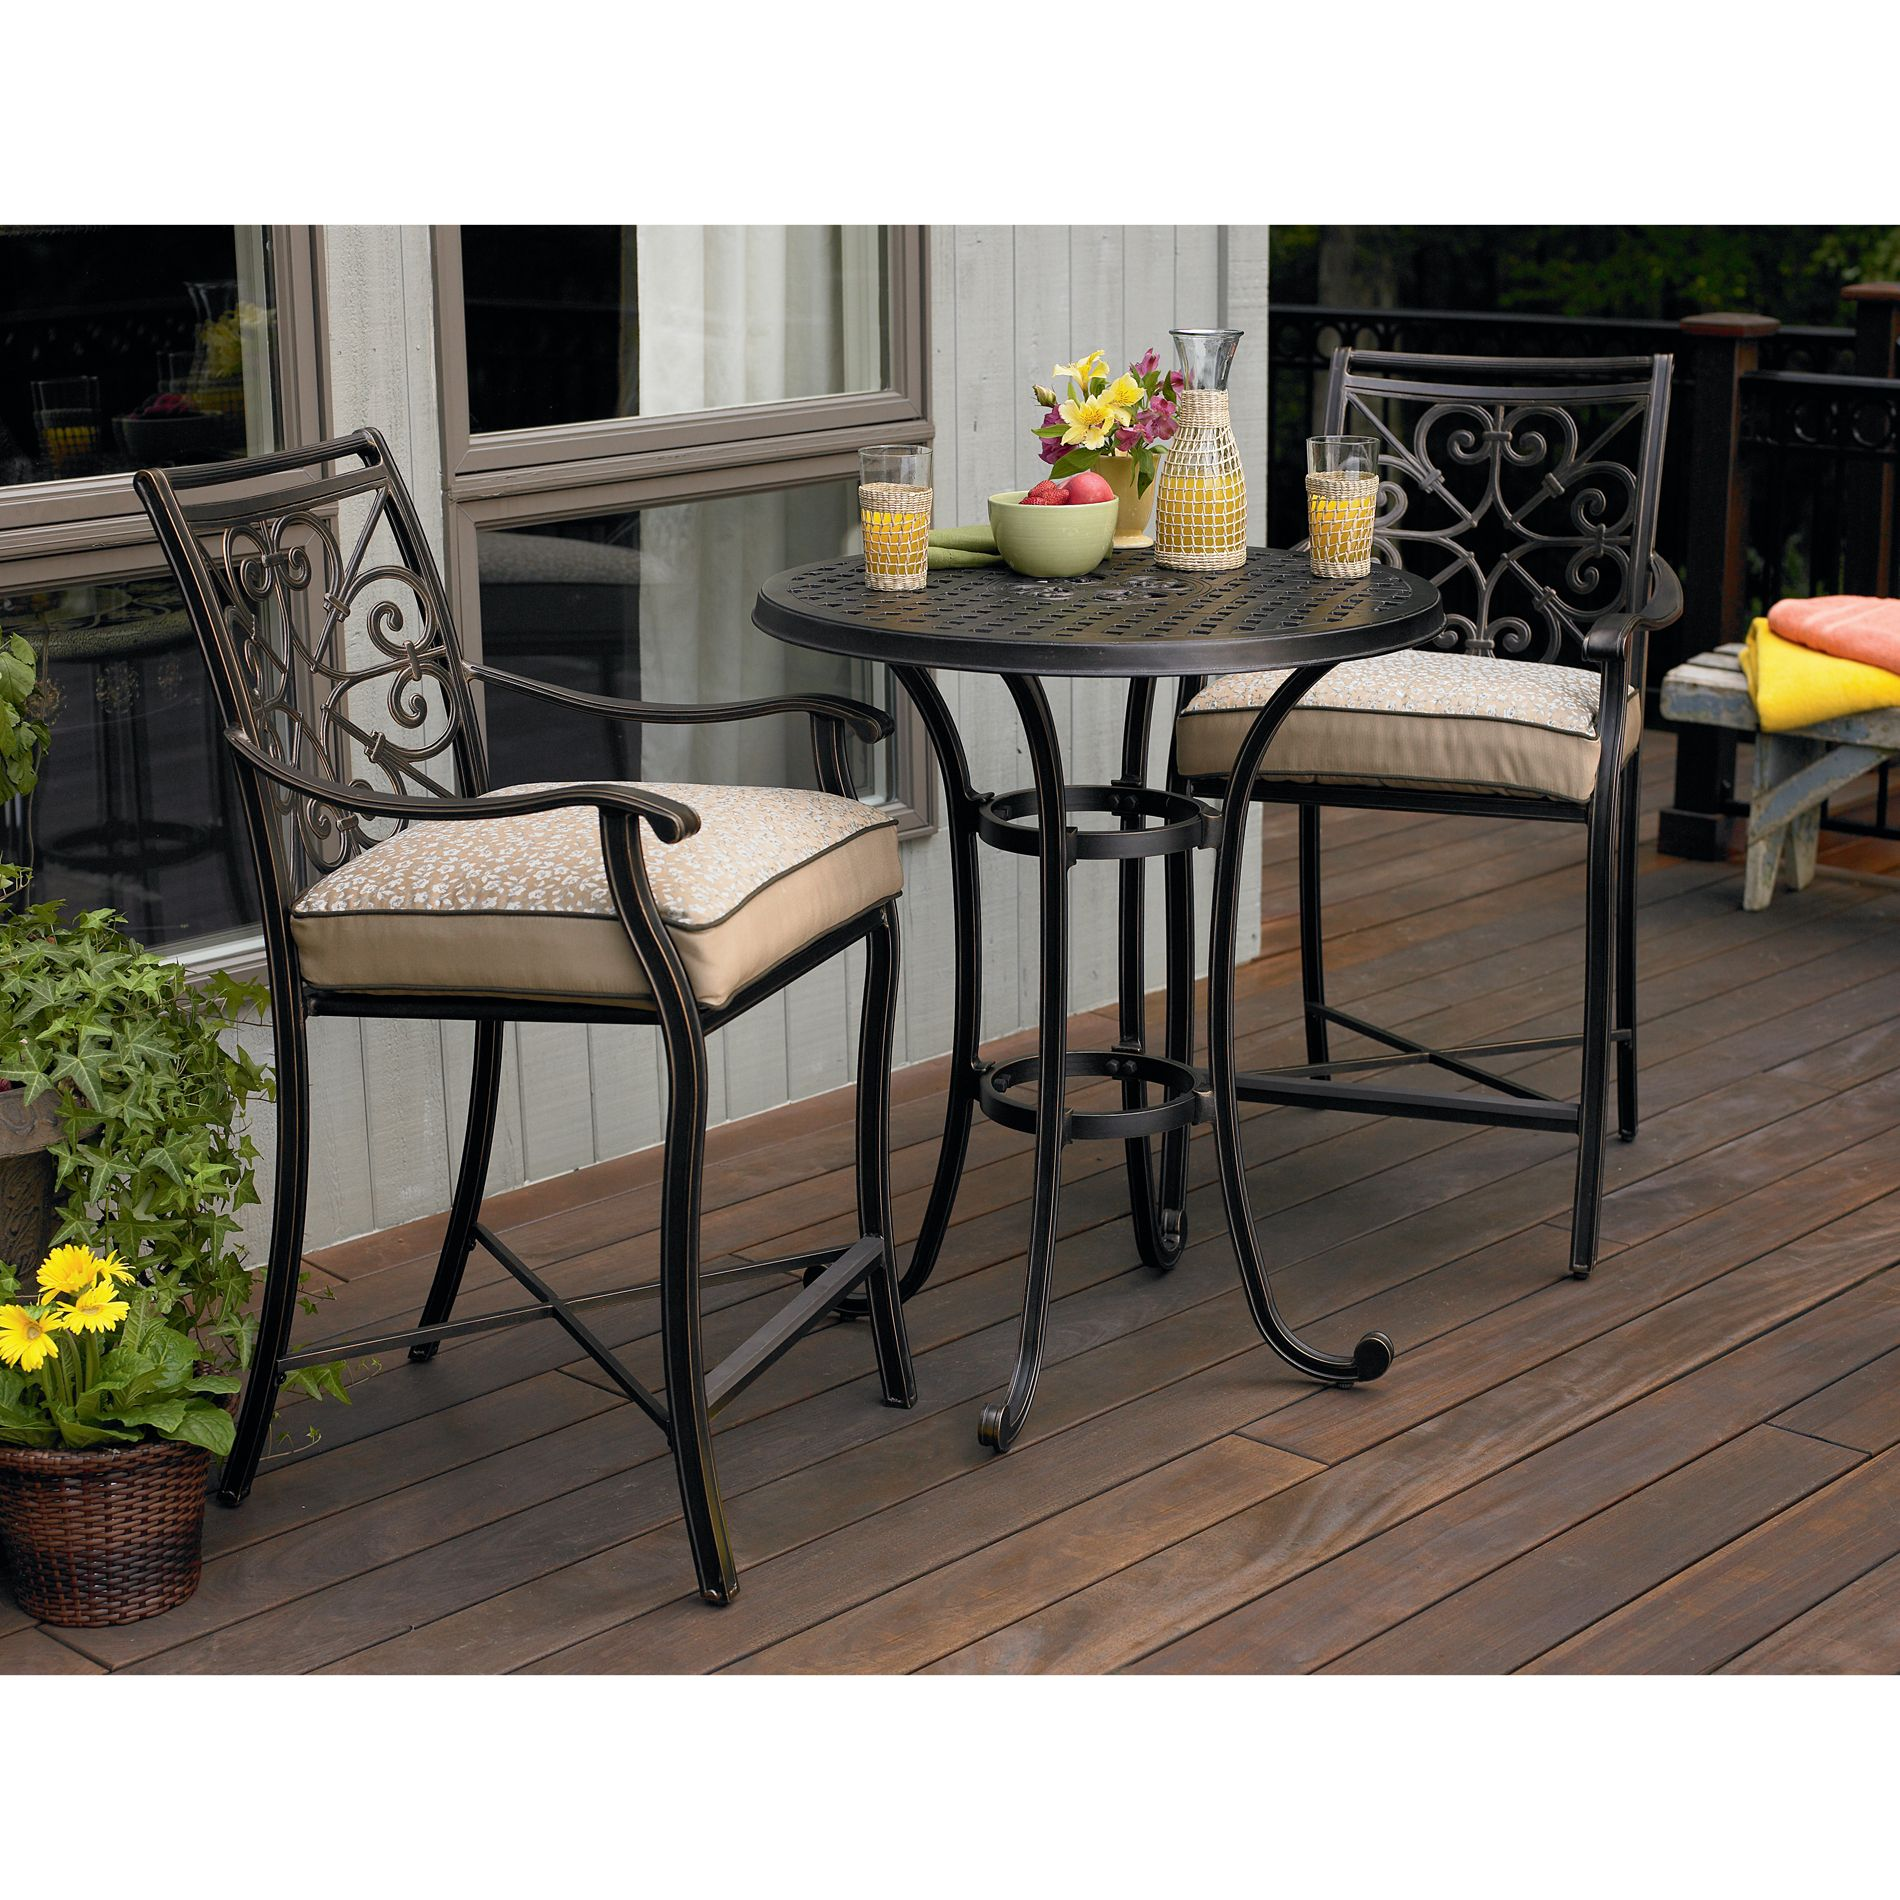 patio dining sets balcony height photo - 9